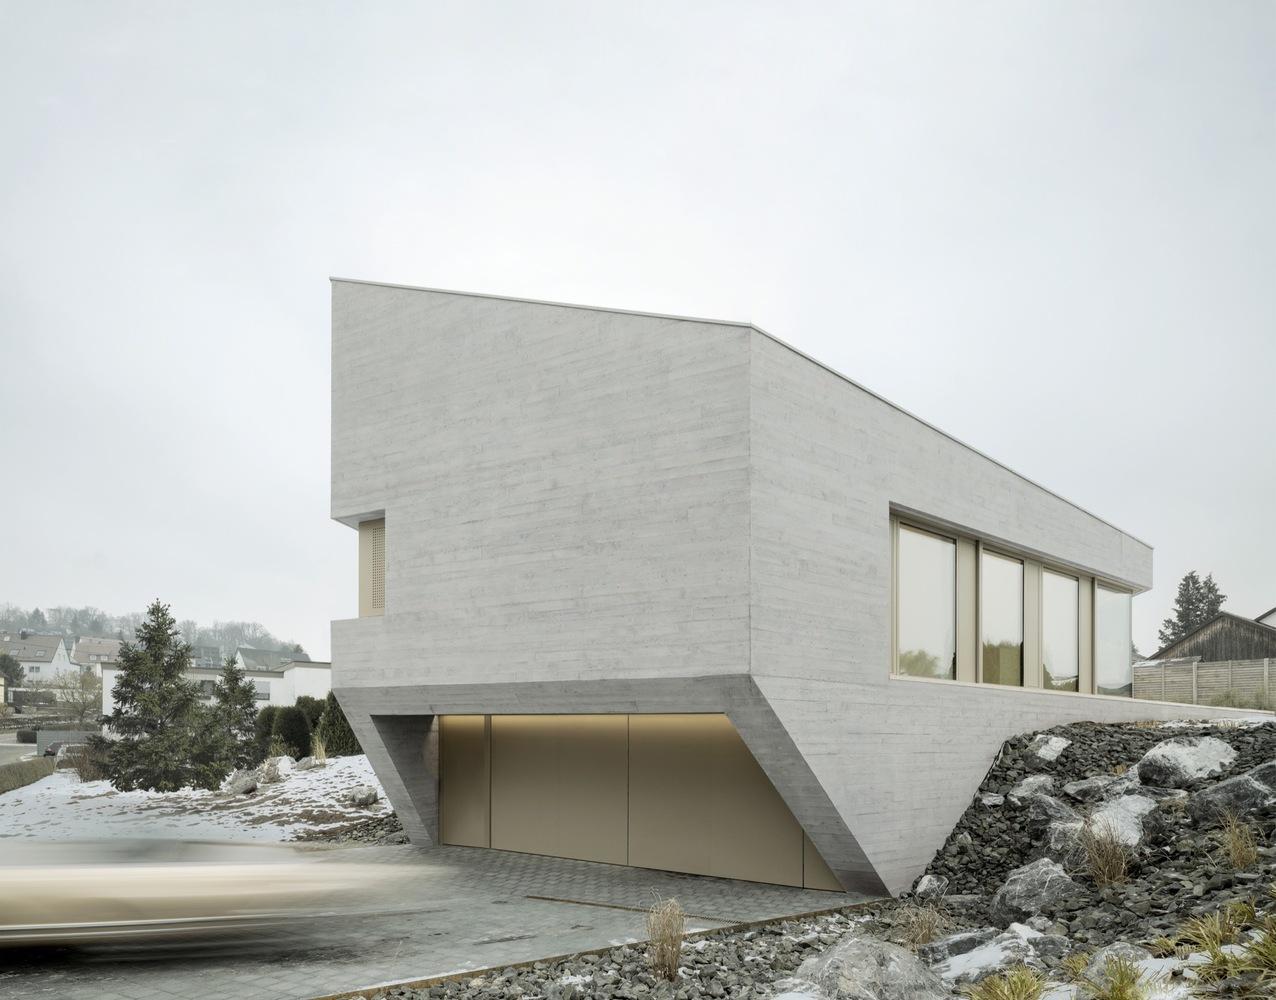 9_E20 Private Residence_STEIMLE ARCHITEKTEN BDA_Inspirationist